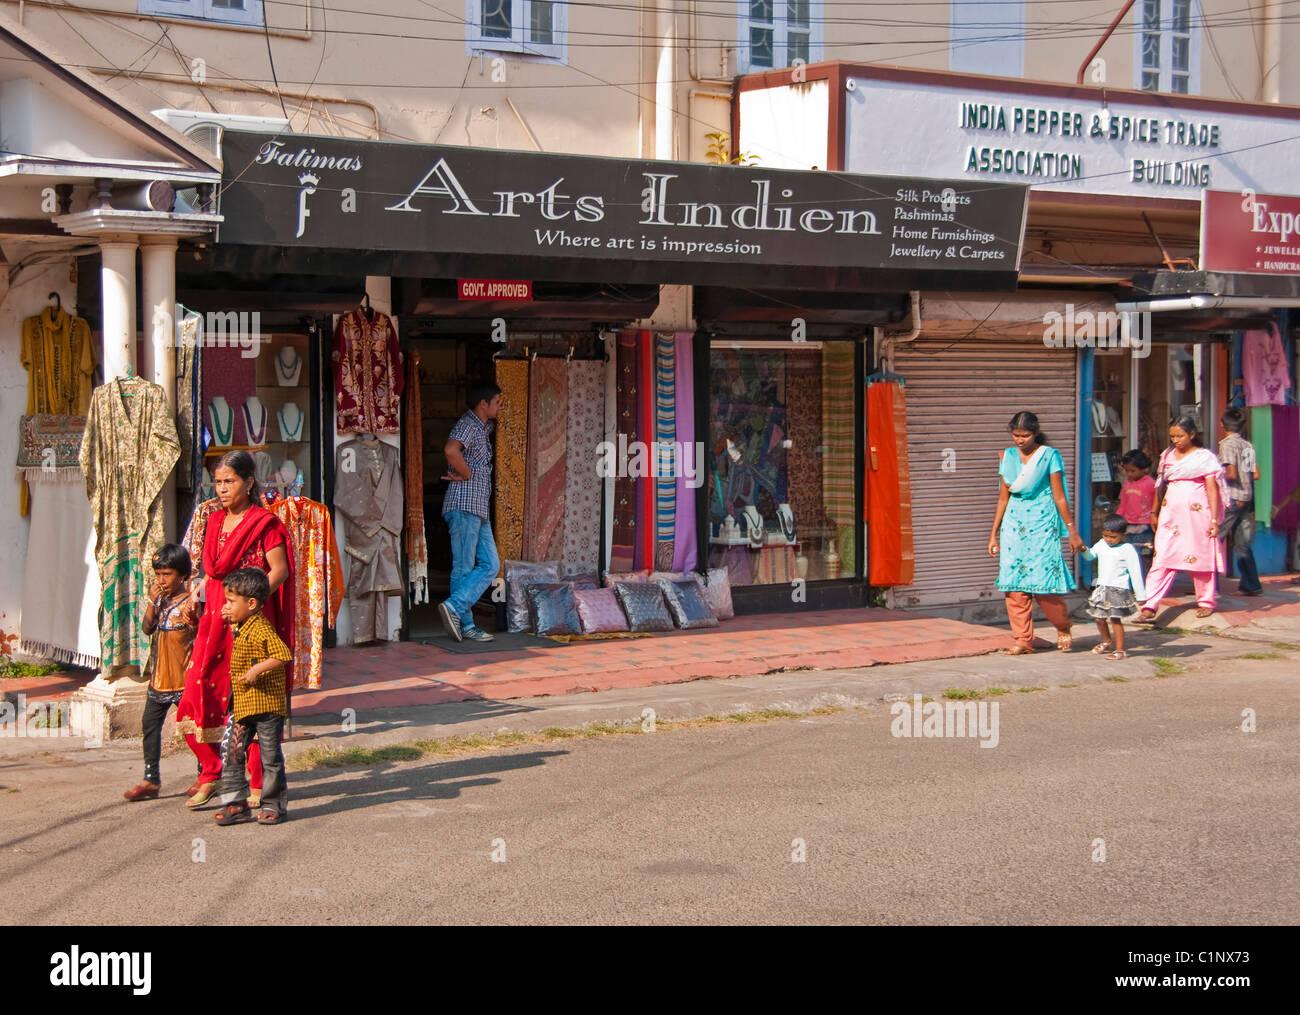 Tourist shop in Jew Town section of Cochin (Kochi), Kerala - Stock Image